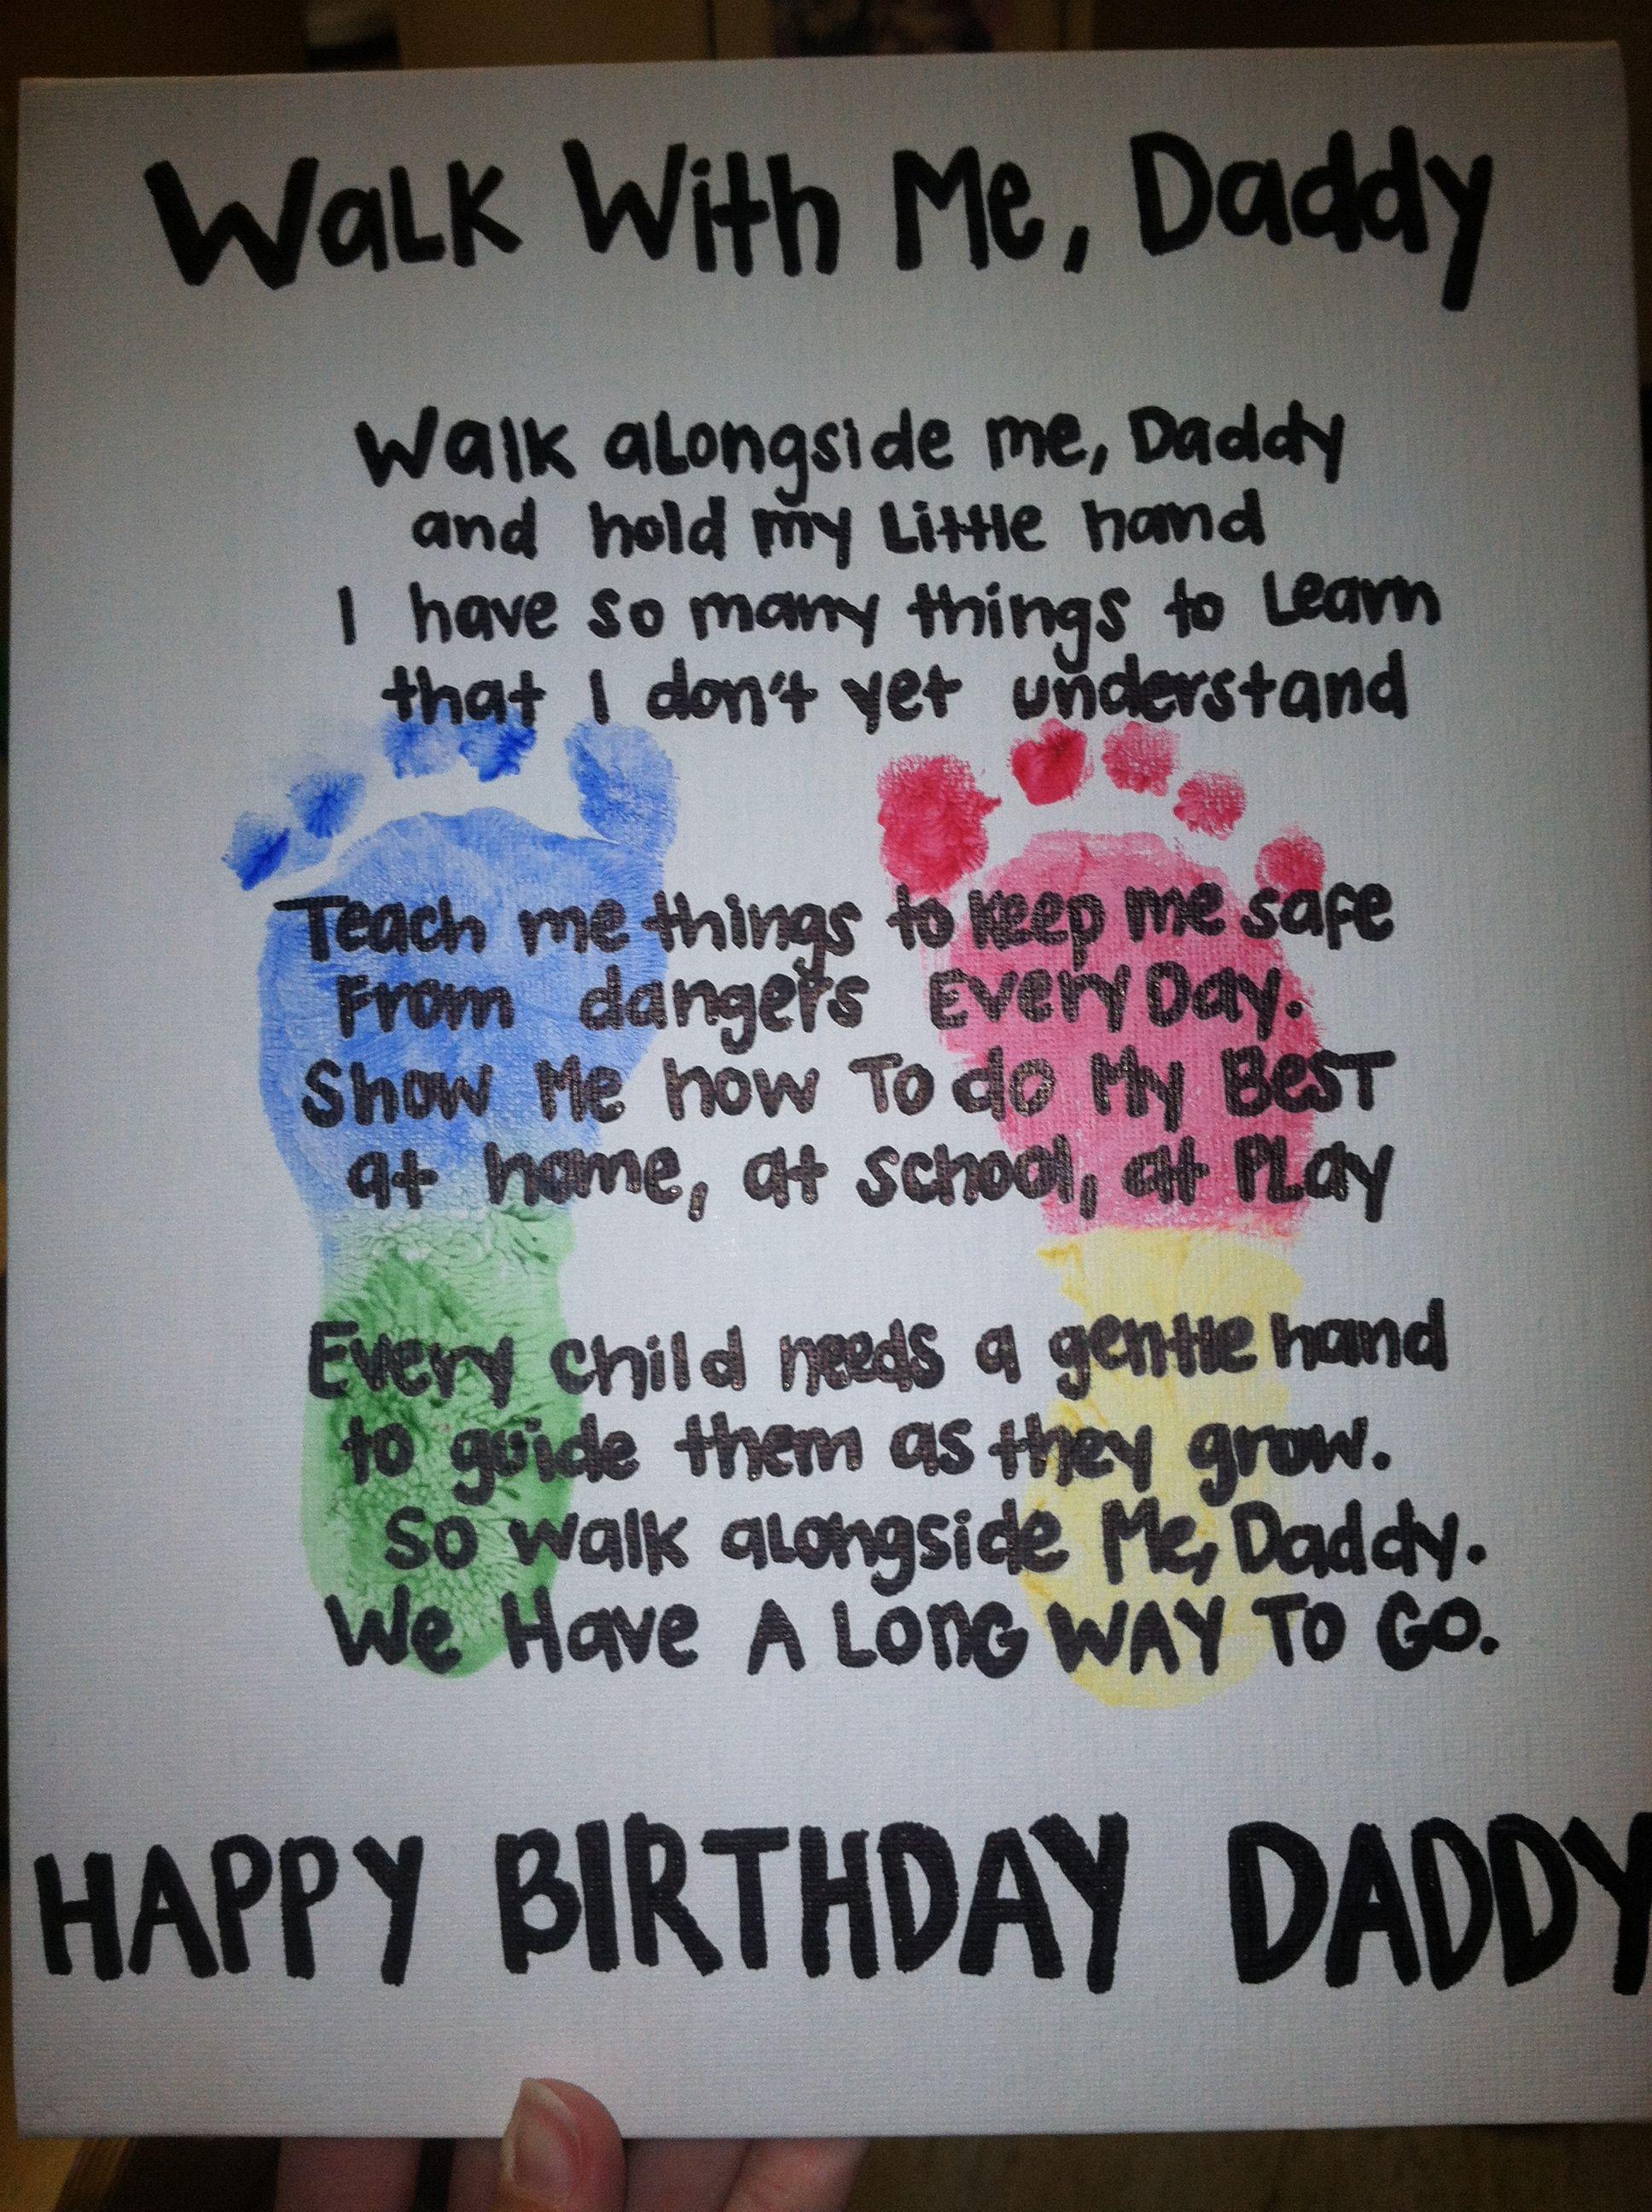 Dana Kendrick Cute Birthday Card Idea Dad Birthday Card Happy Birthday Daddy Daddy Birthday Gifts